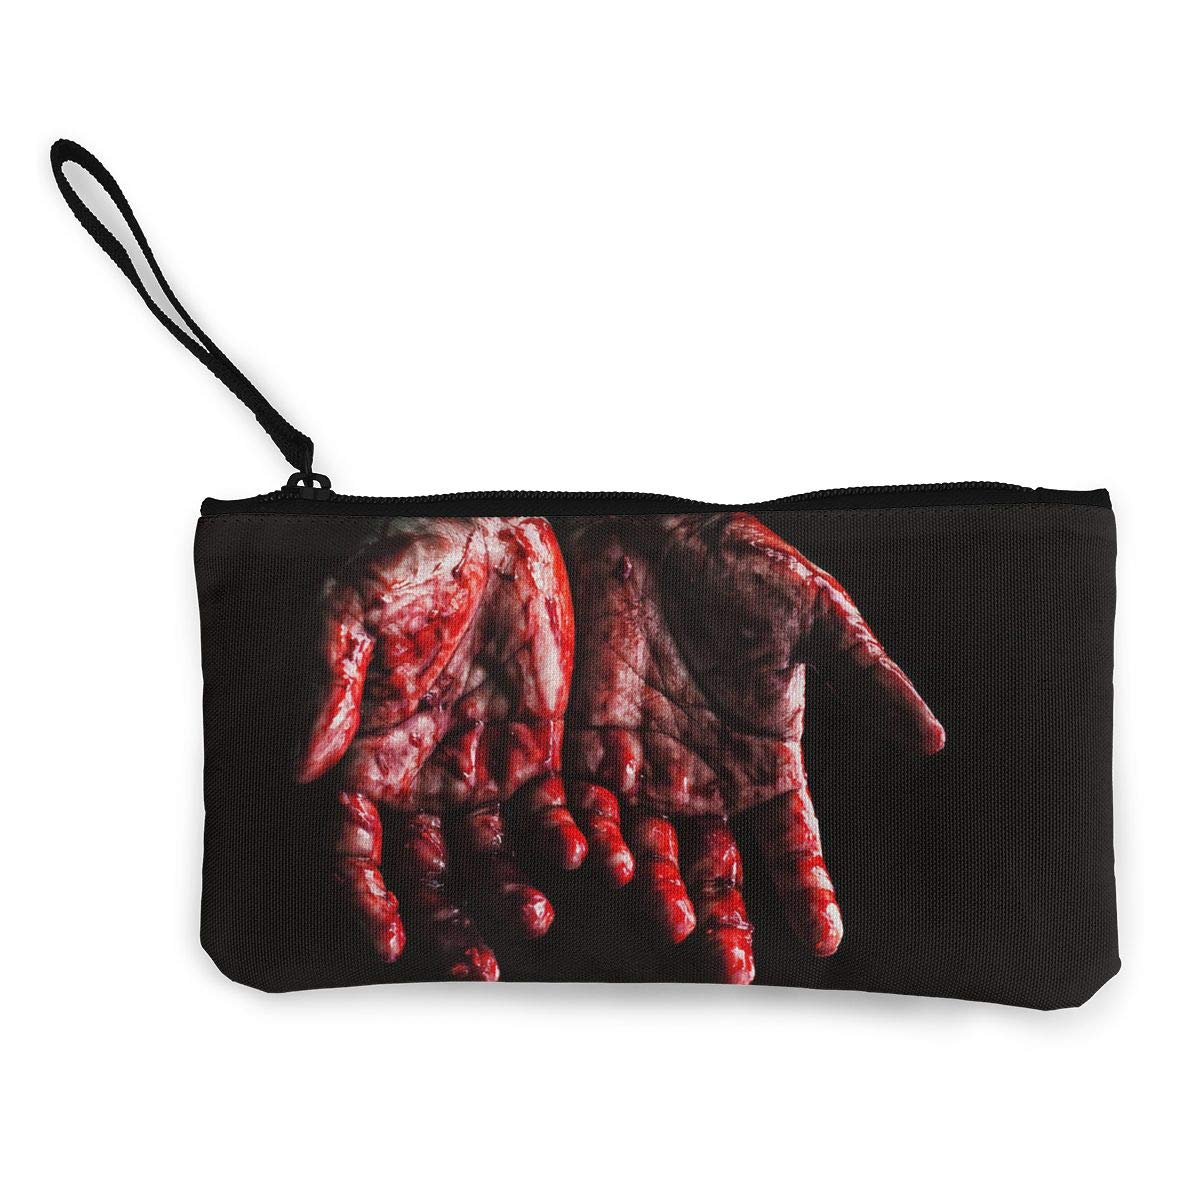 Canvas Cash Coin Purse,Hand Full Of Blood Print Make Up Bag Zipper Small Purse Wallets